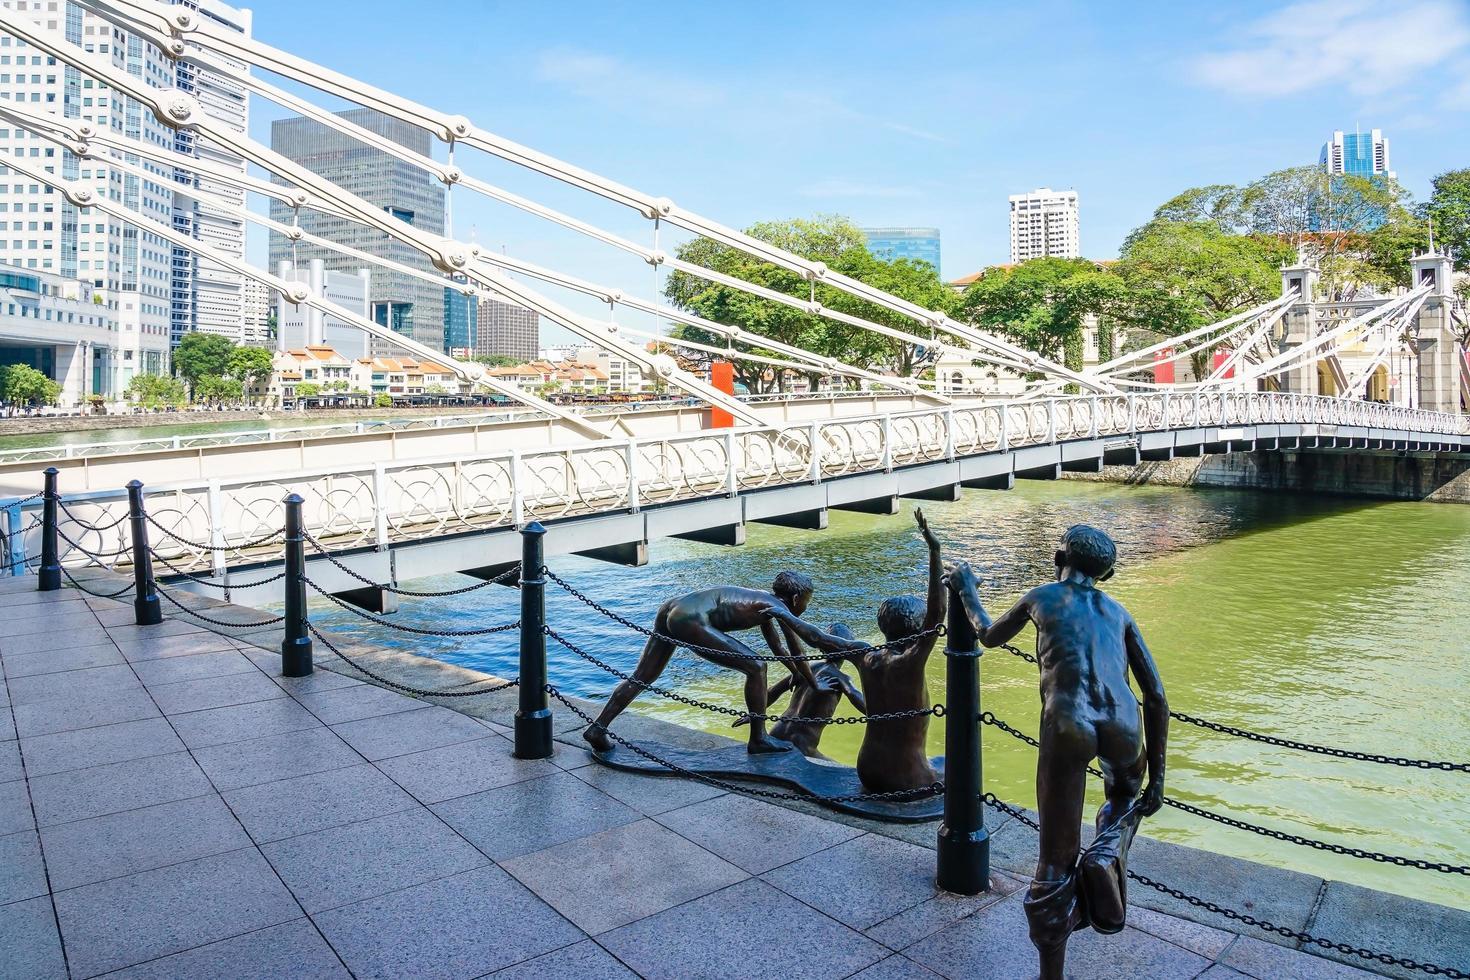 Cavenagh Brücke über den Singapur Fluss in Singapur foto